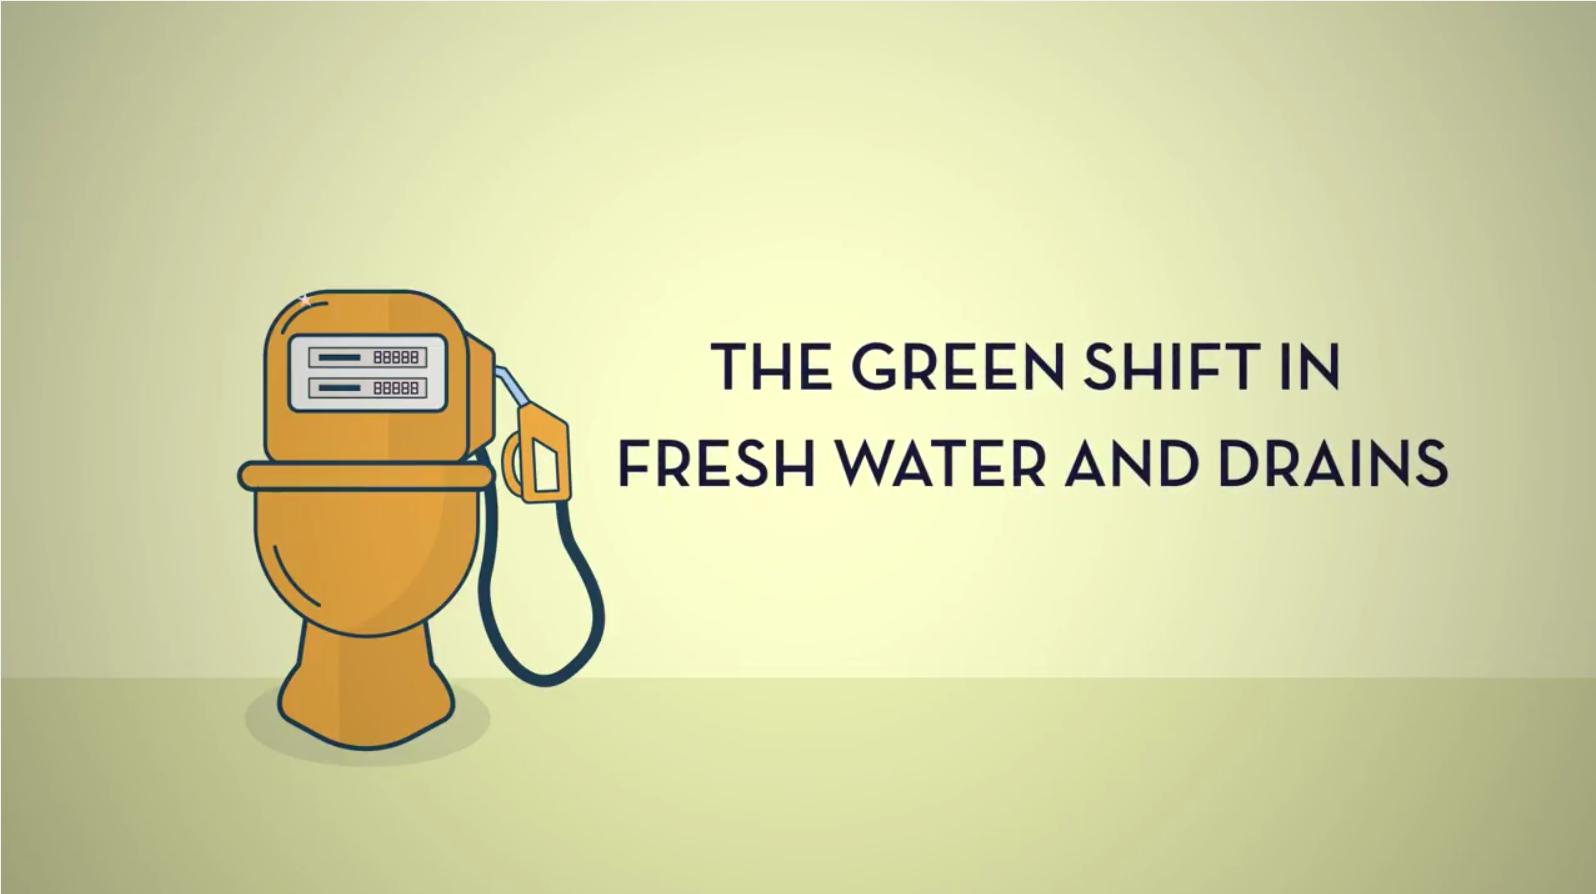 Det grønne skiftet forklart